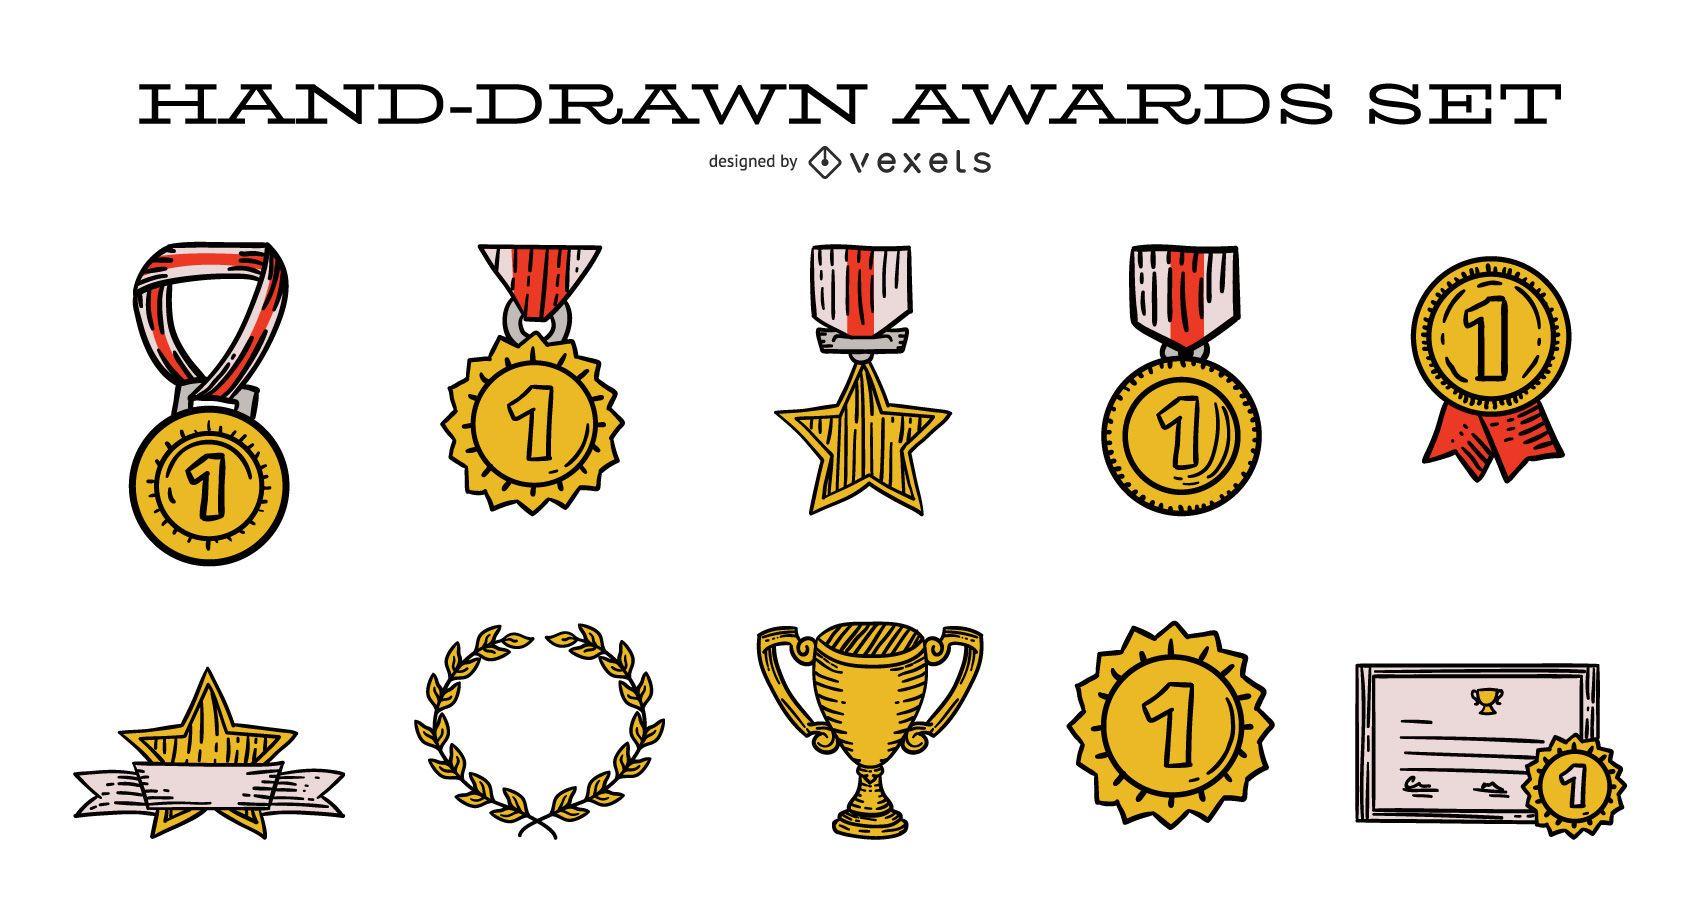 Hand-drawn Award Illustration Set